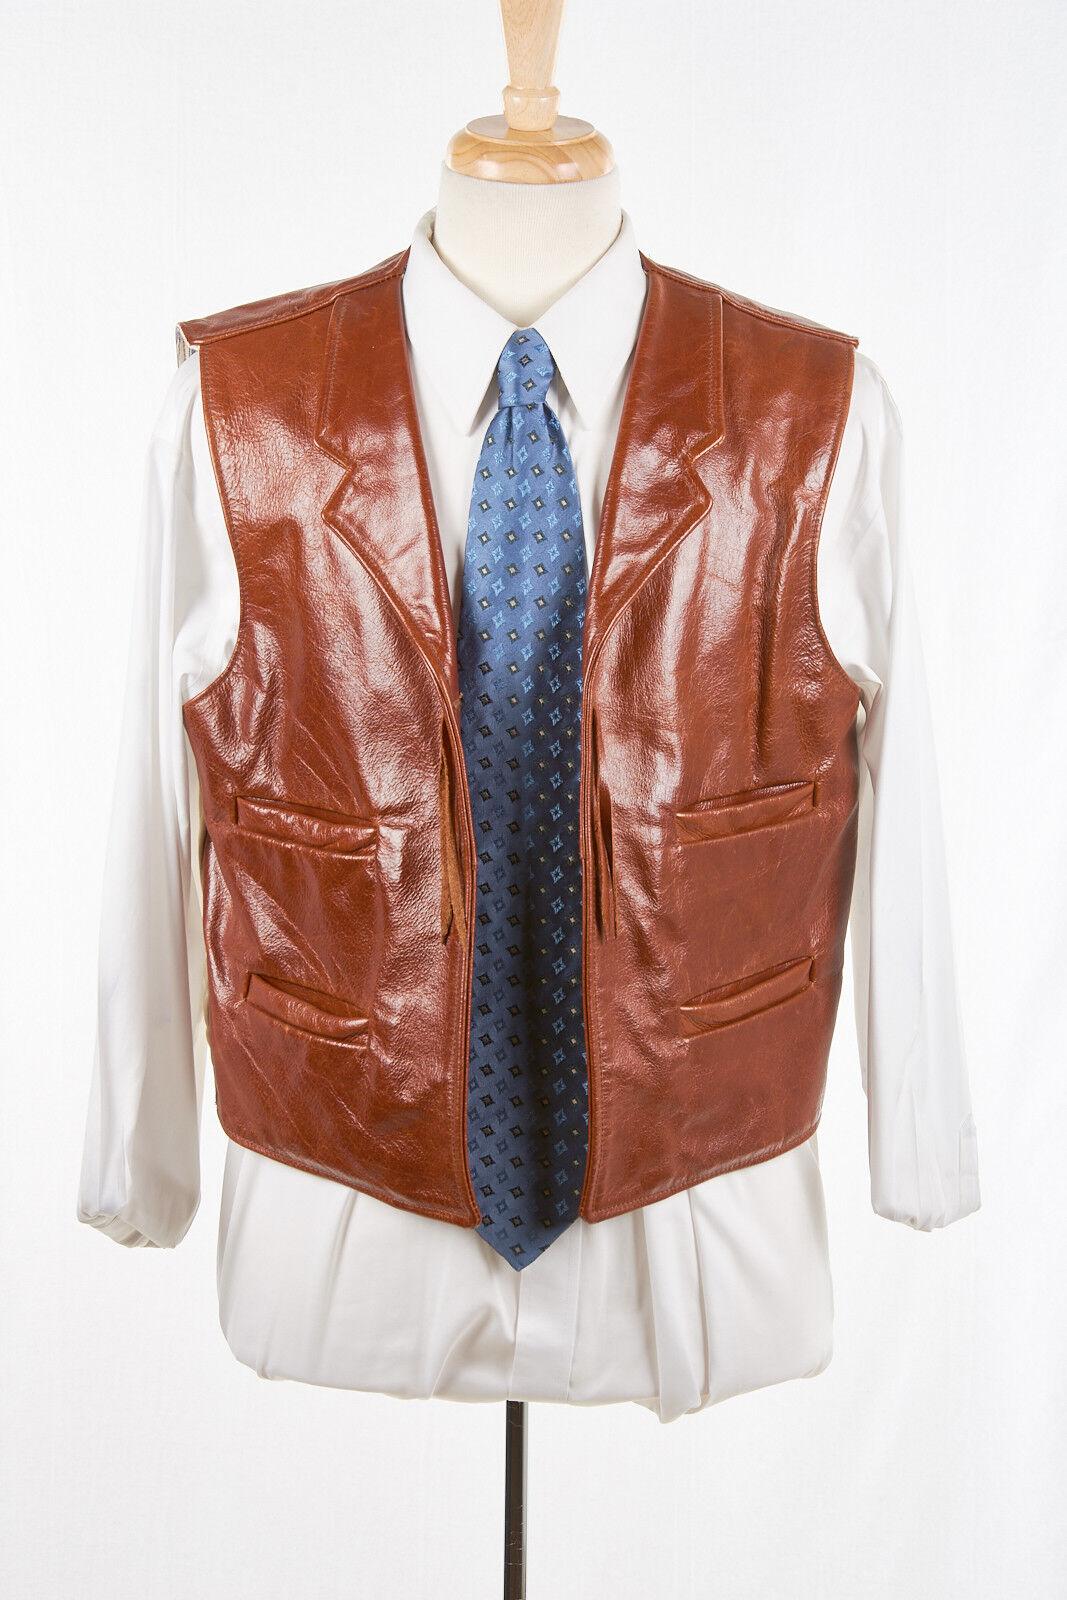 Herren CLASSIC STYLES Leder Vest Sz M in Caramel Braun Western Reenactment Waisc